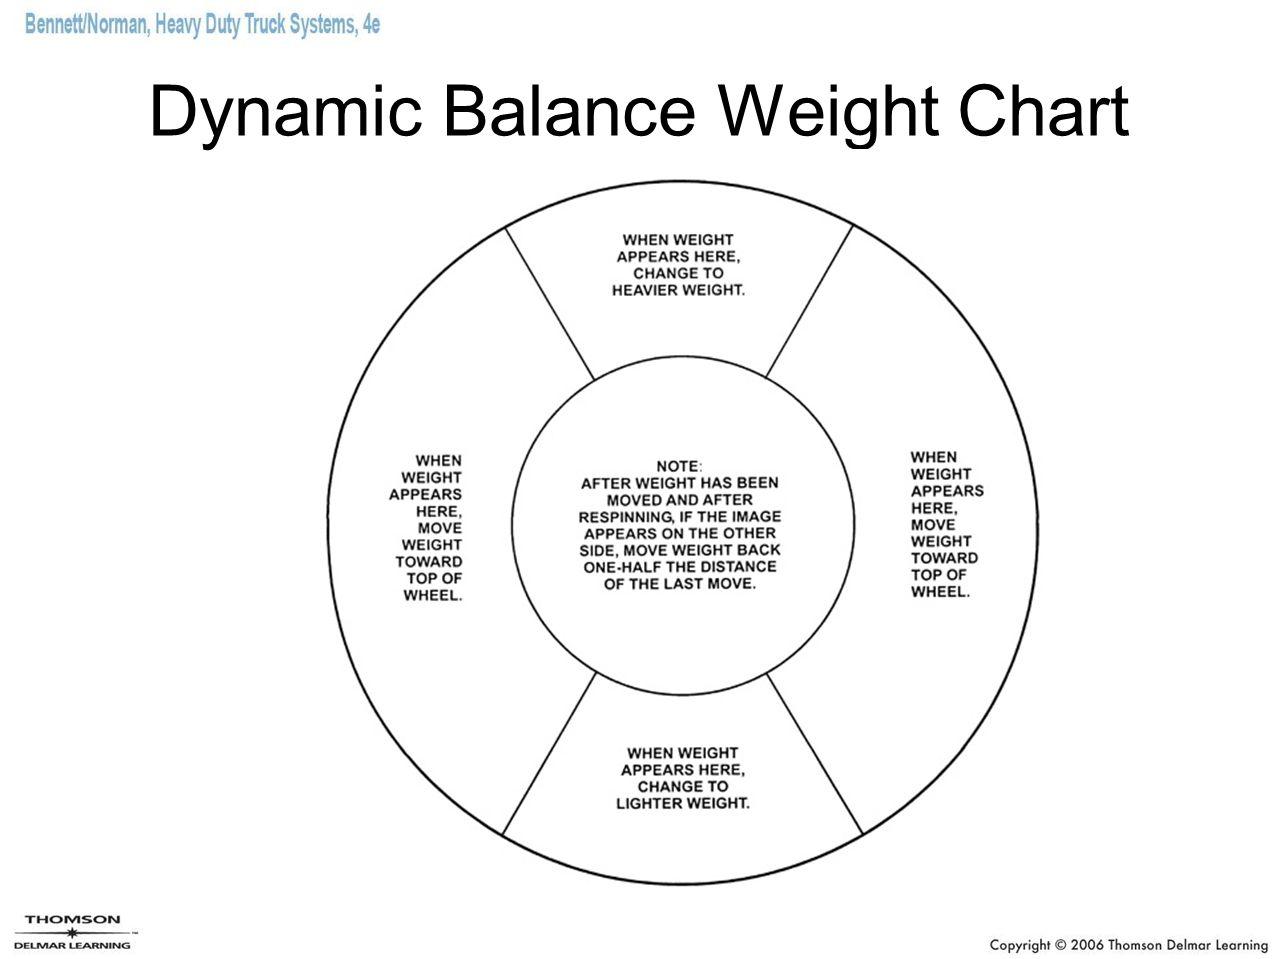 Dynamic Balance Weight Chart